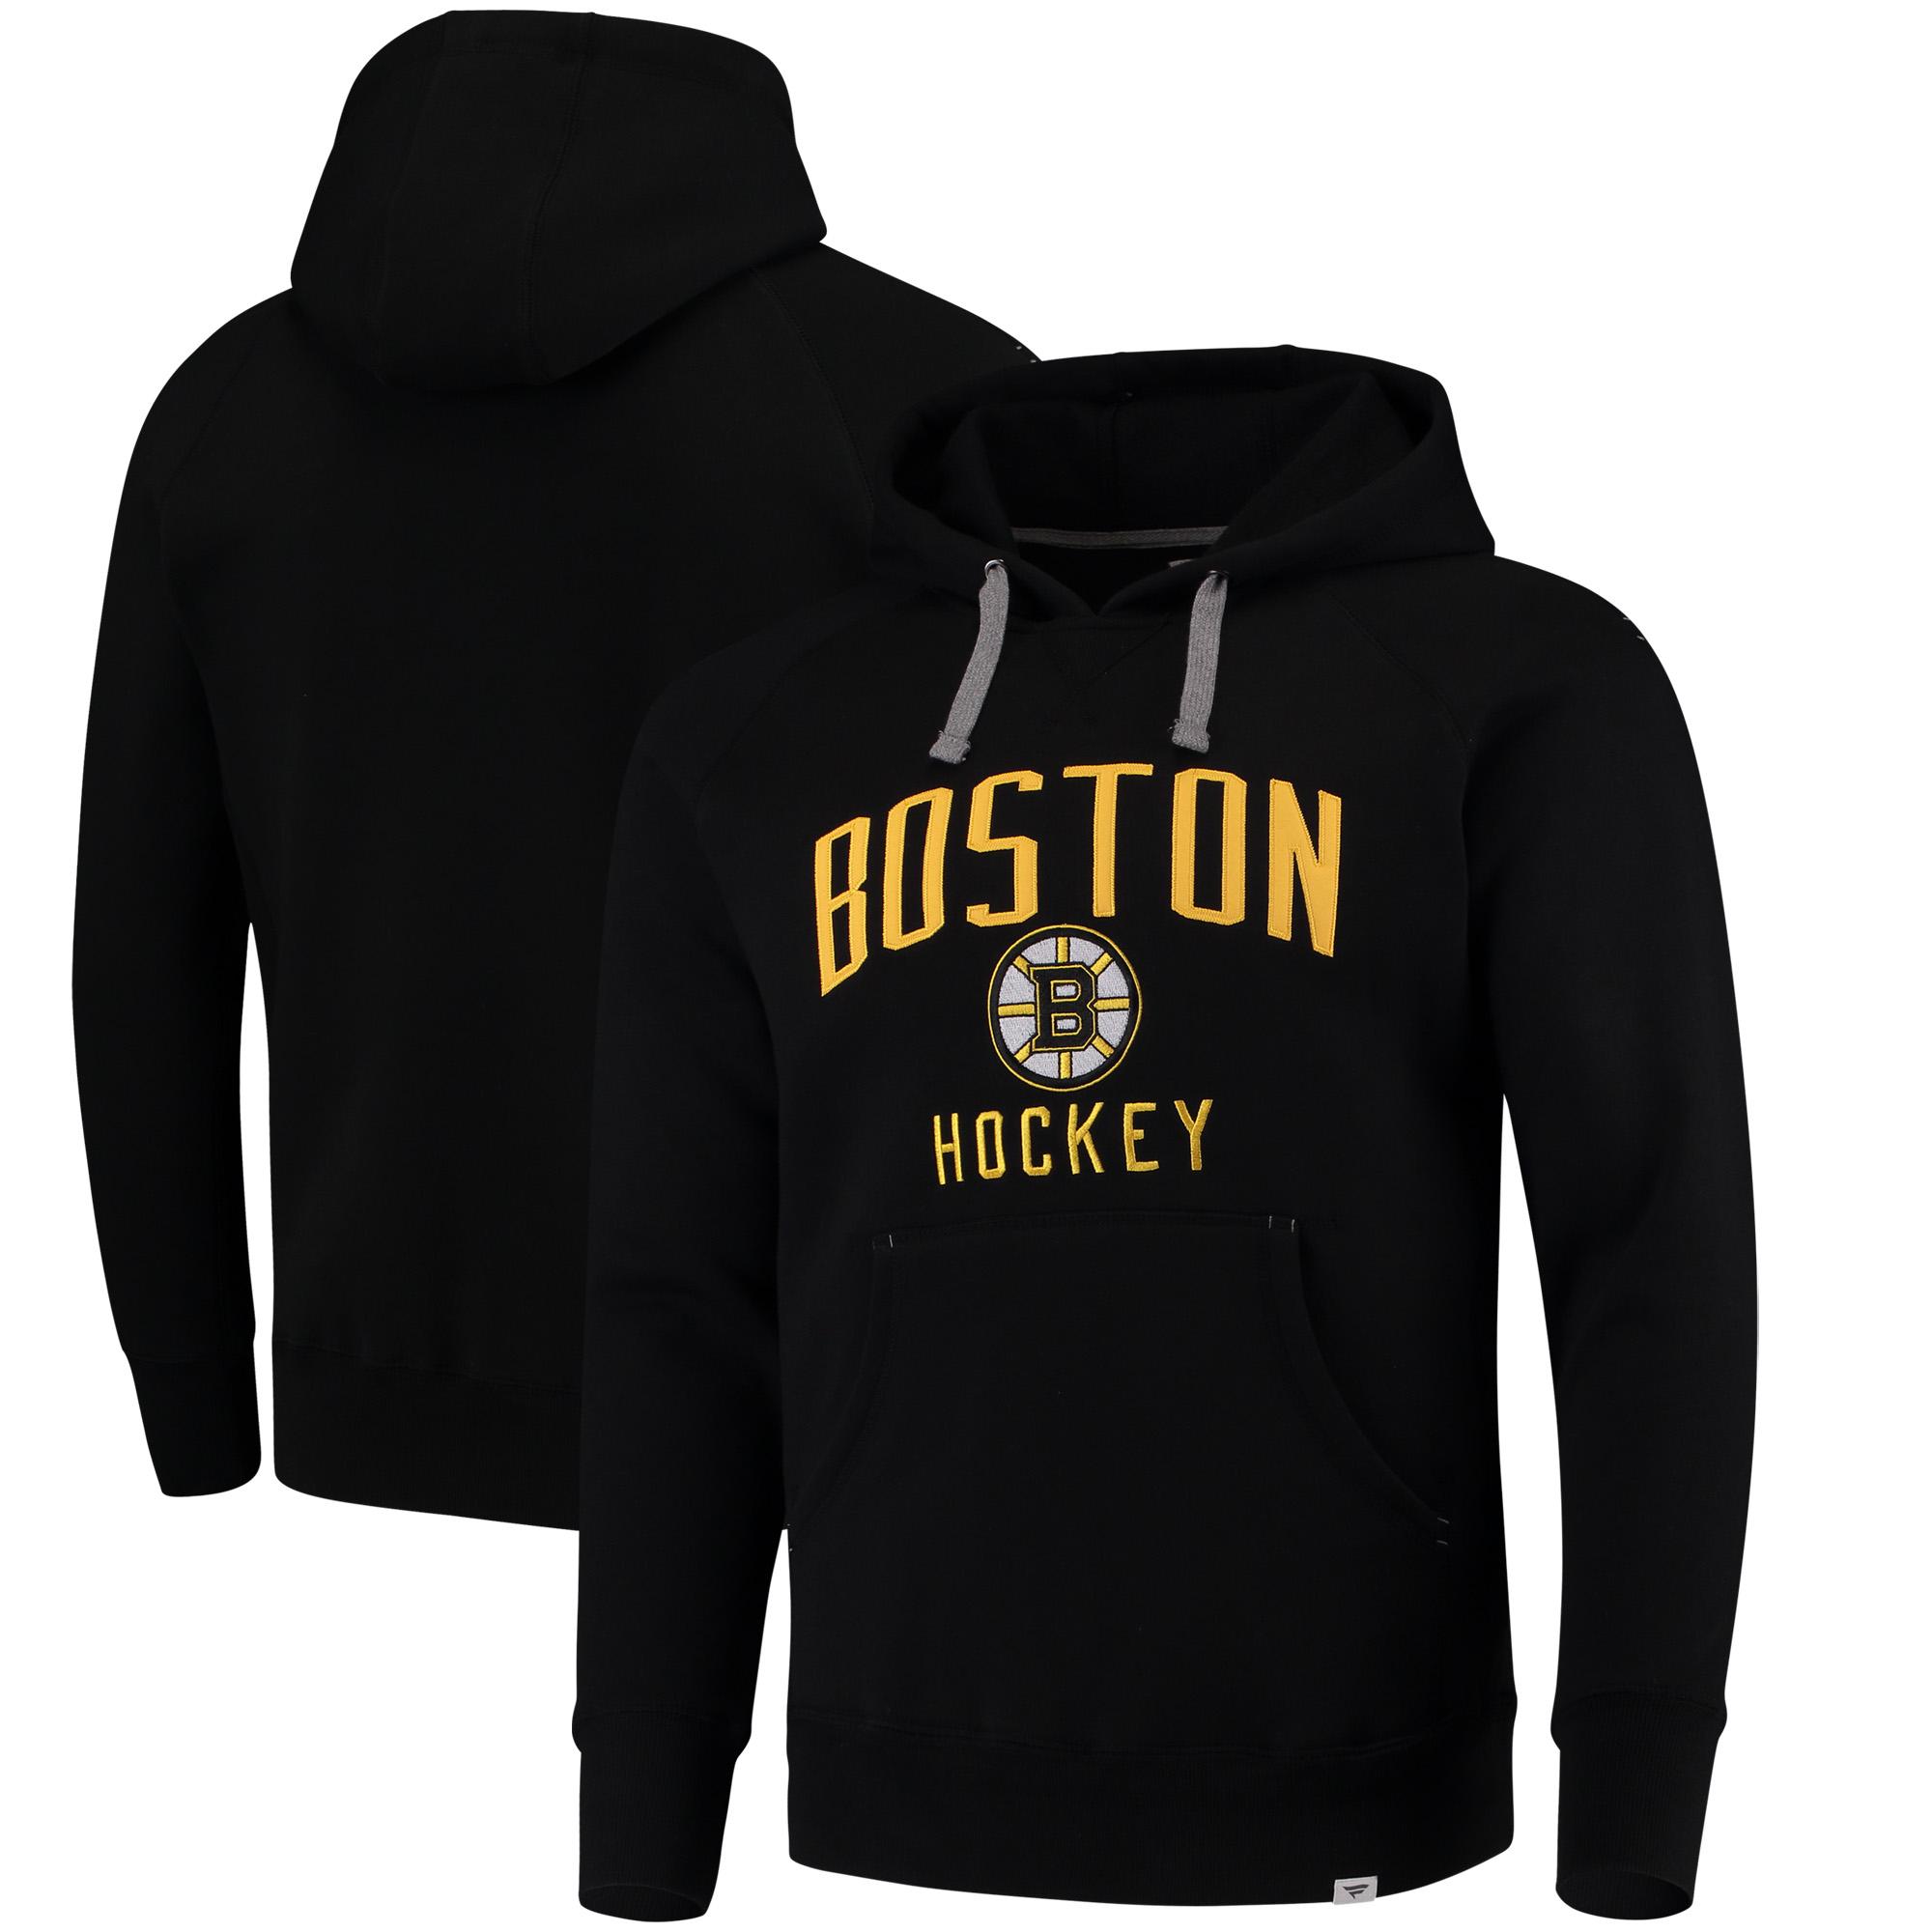 Boston Bruins Fanatics Branded Indestructible Pullover Hoodie - Black